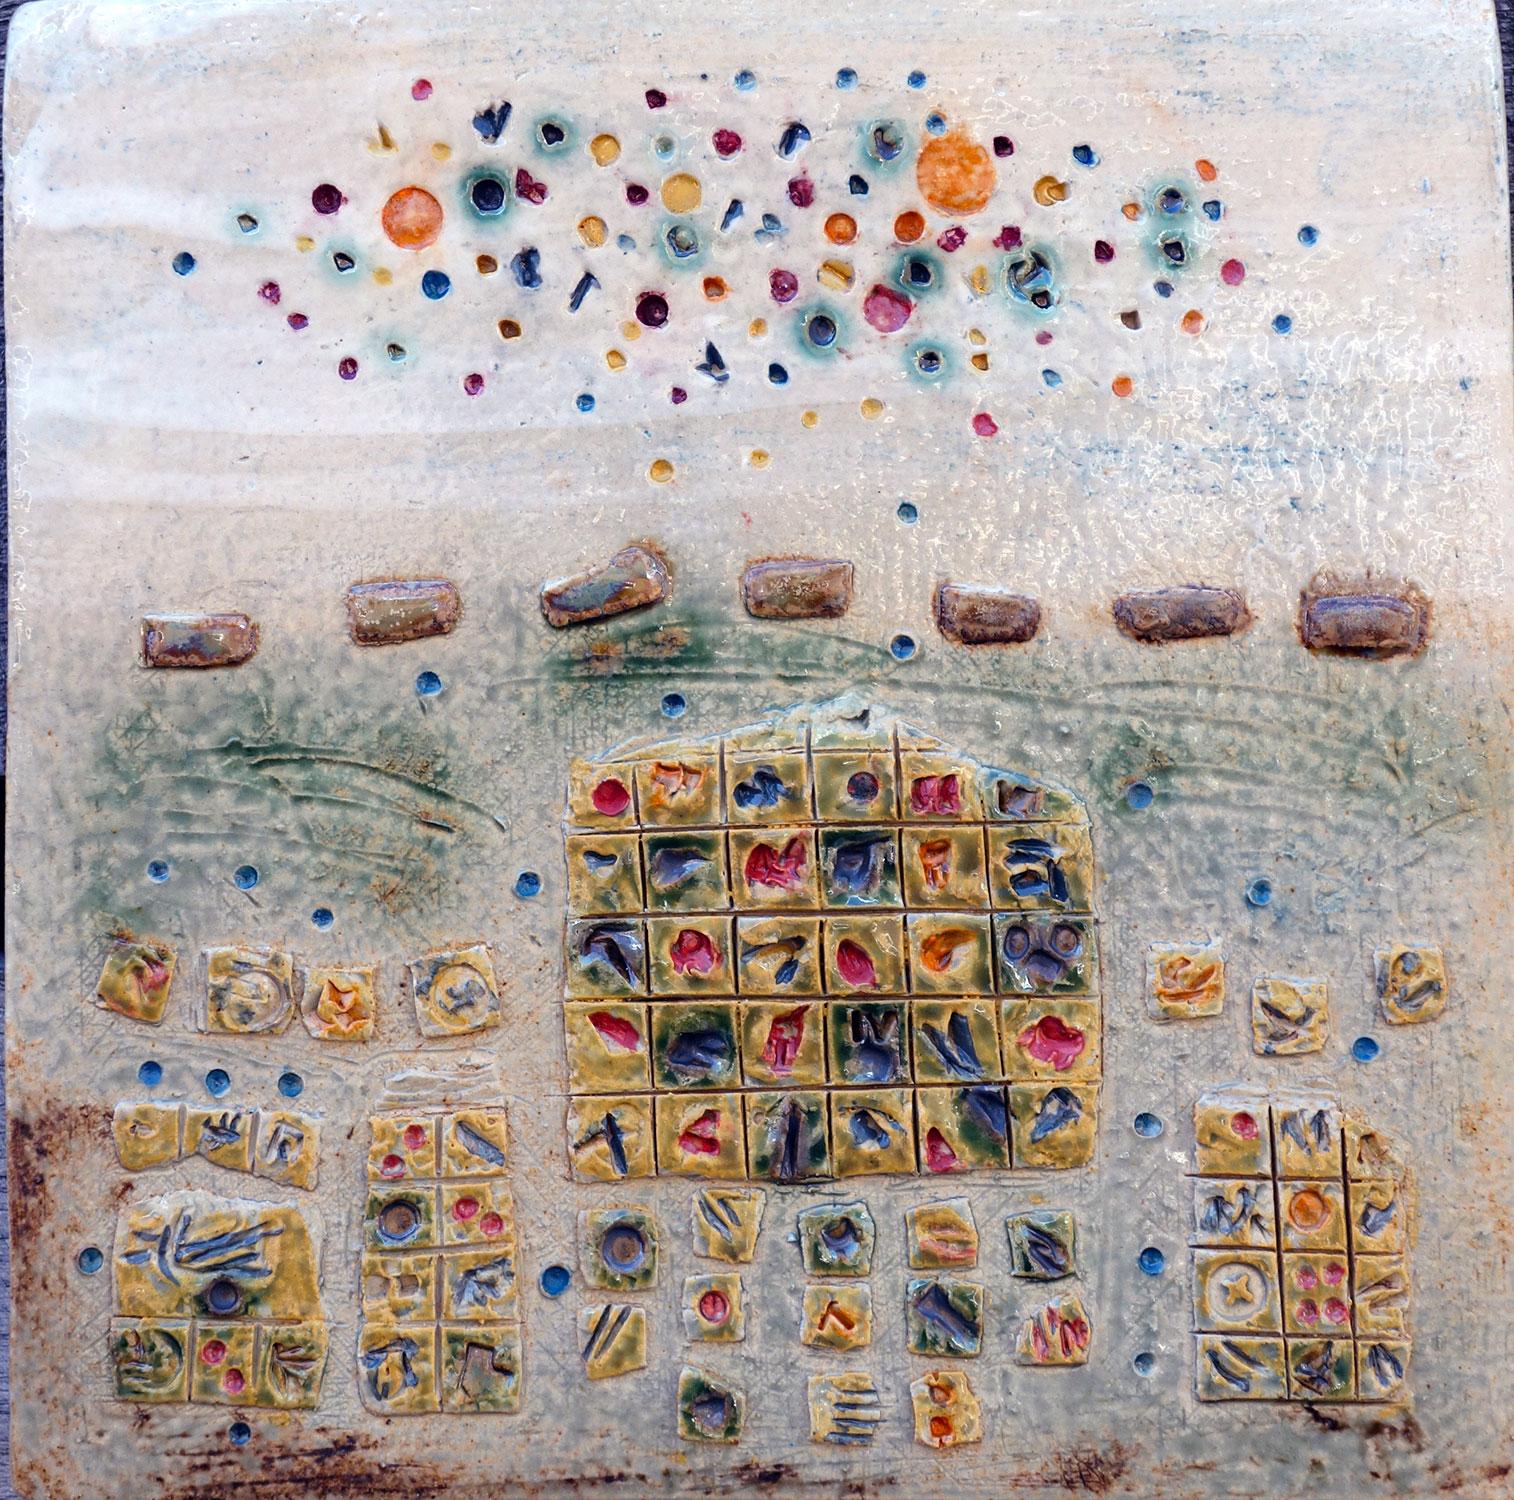 Babylonian Garden IV: Autumn light- Qassim Alsaedy